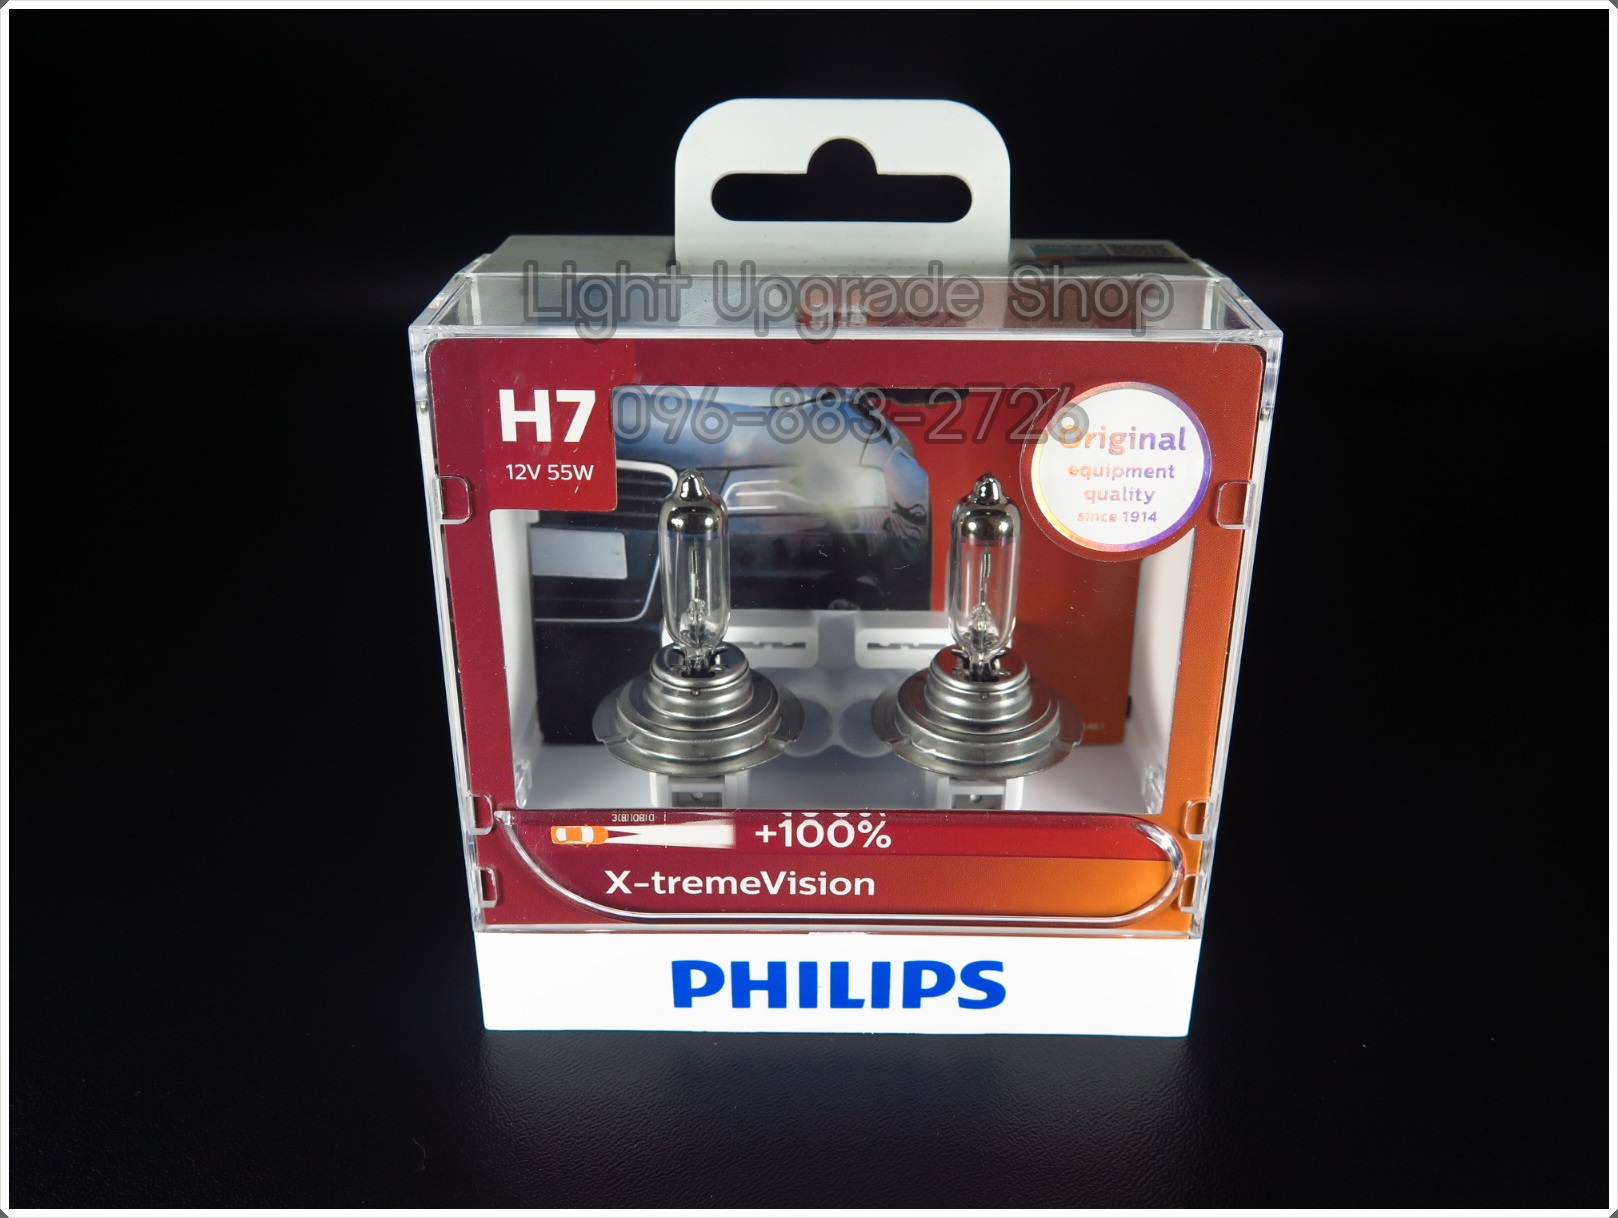 Philips X-Treme Vision +100% [H7]